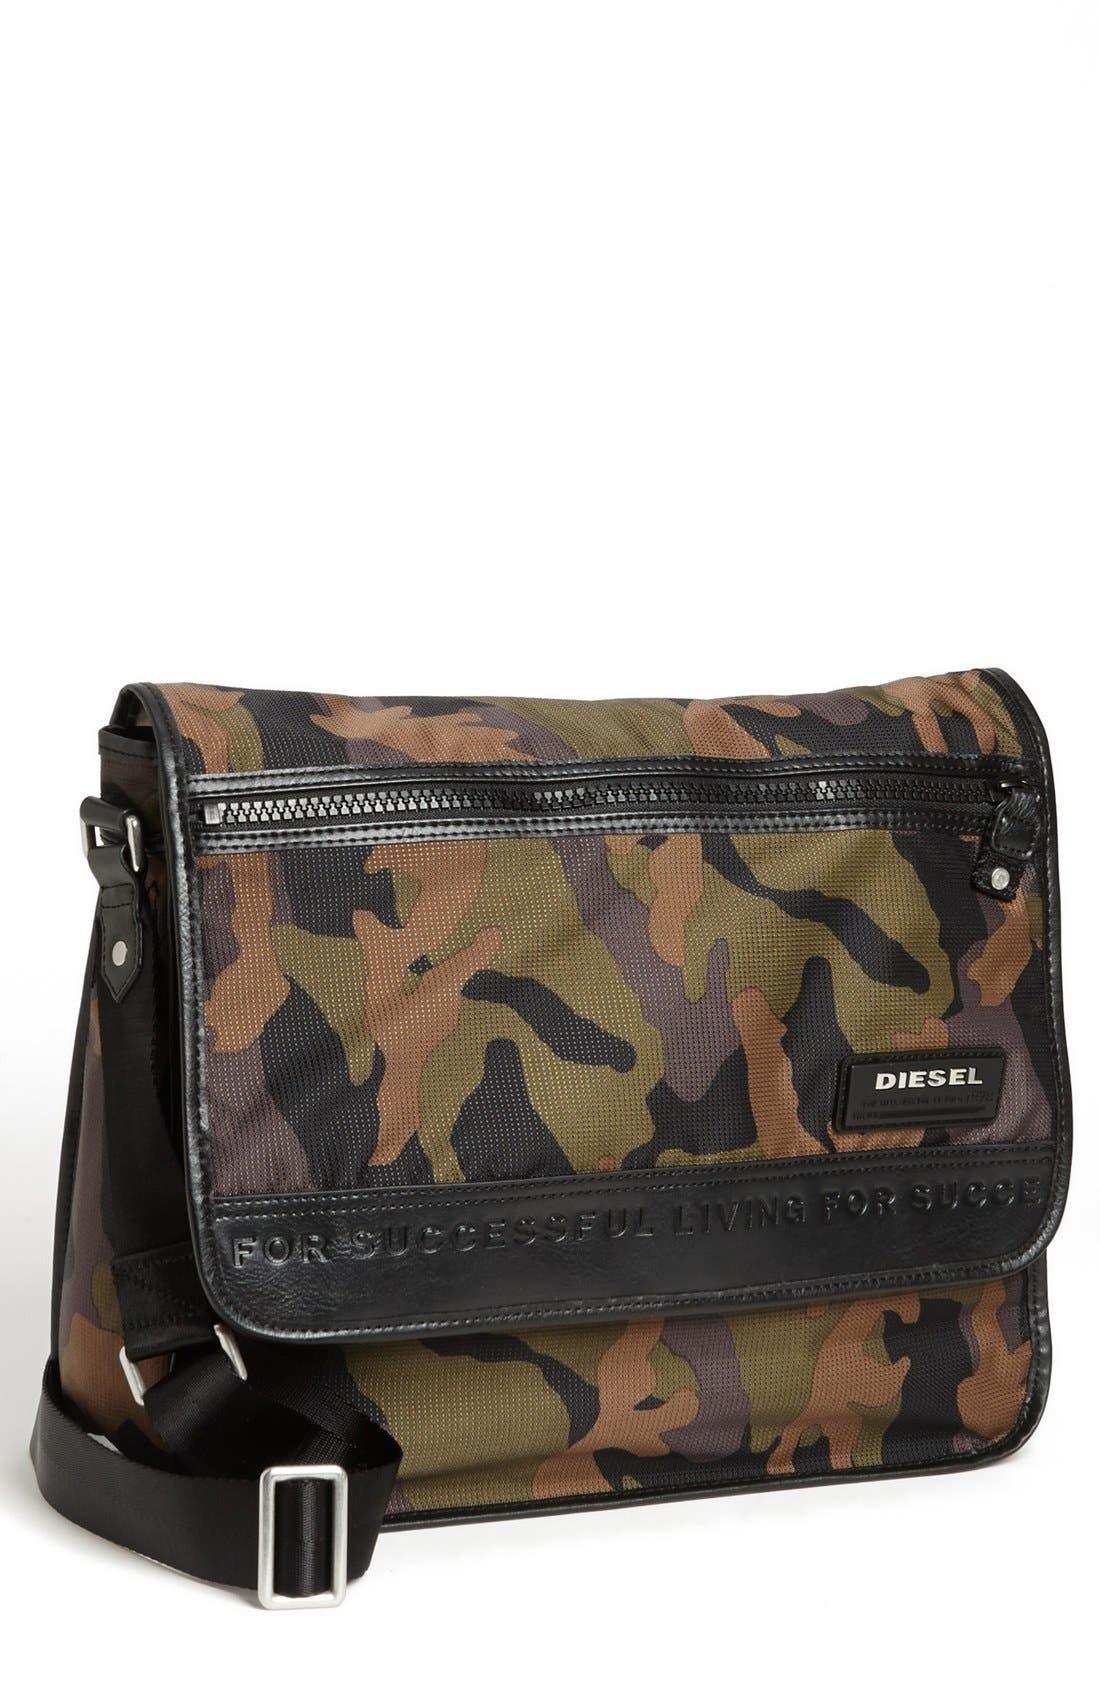 Alternate Image 1 Selected - DIESEL® 'On The Road Twice' Messenger Bag